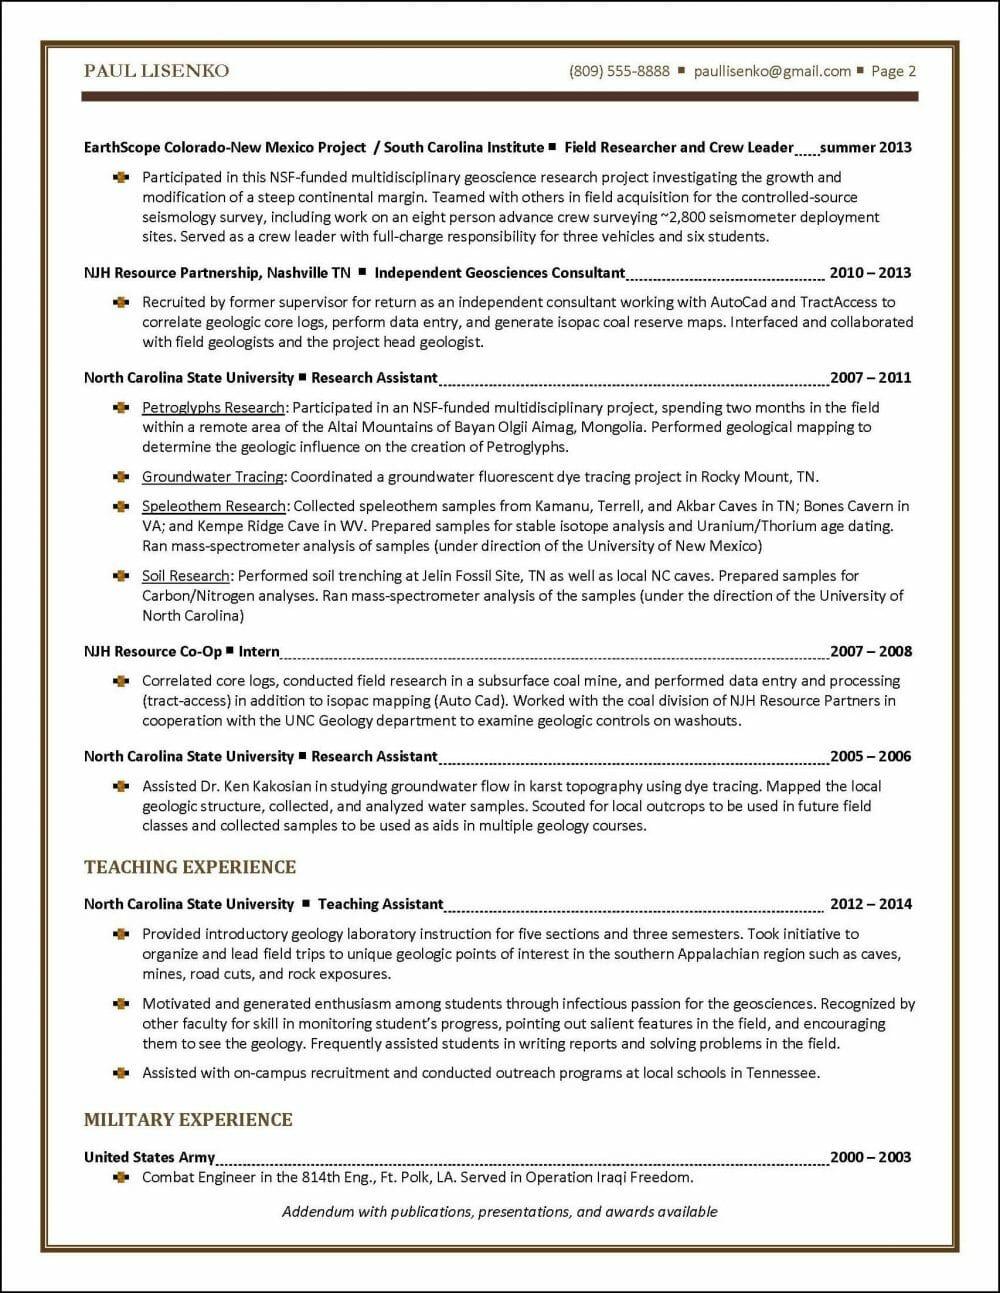 Graduate Student Resume Example | Distinctive Career Services